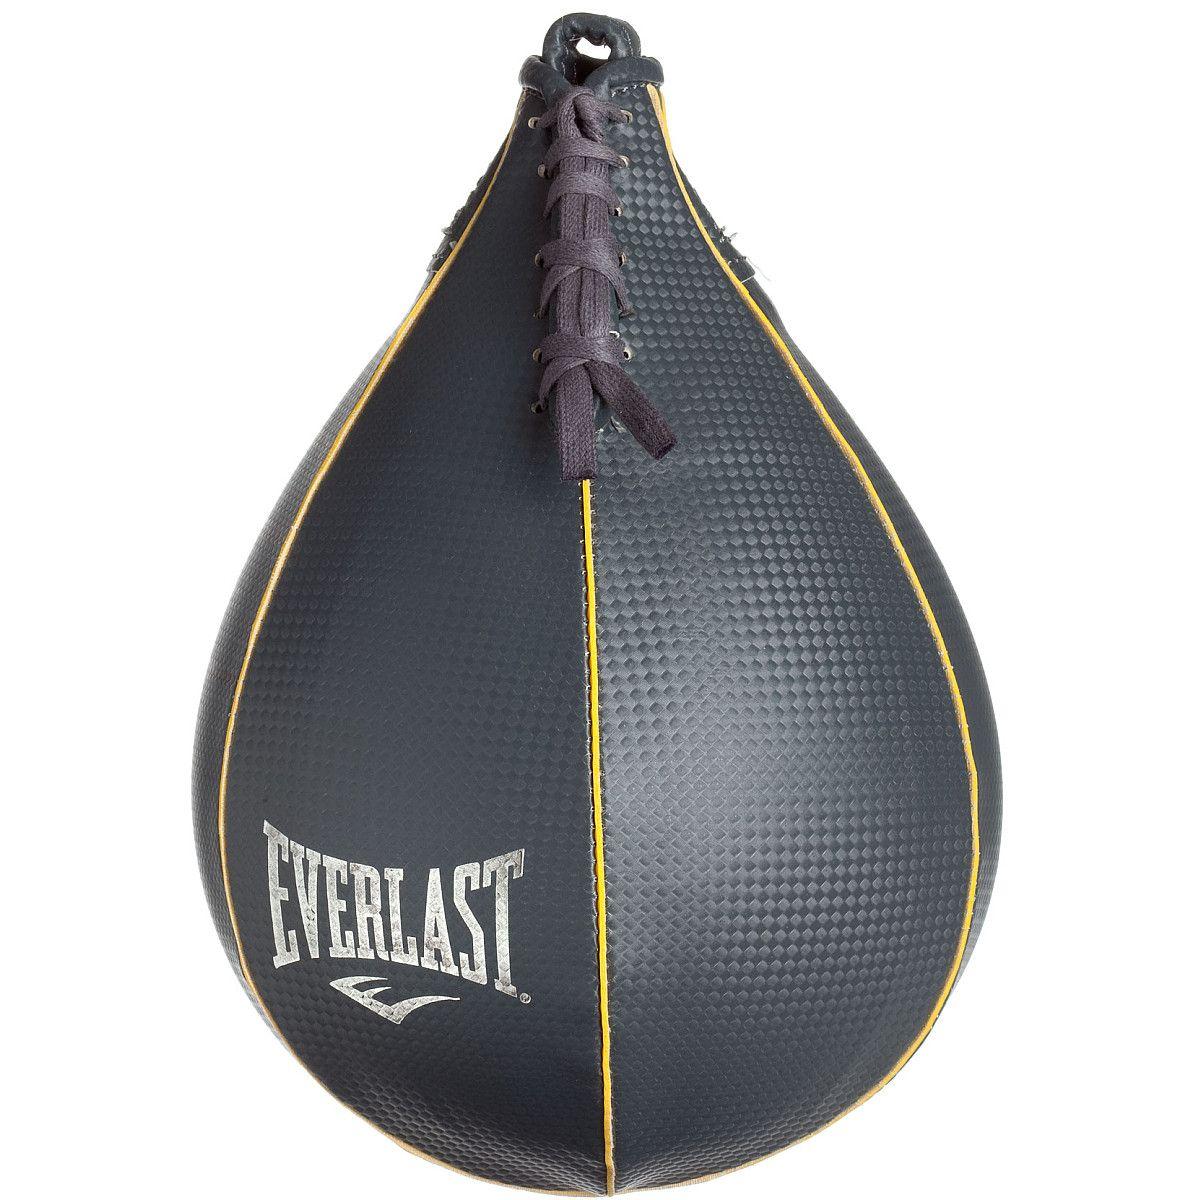 Everlast Lightweight Durahide Speed Bag